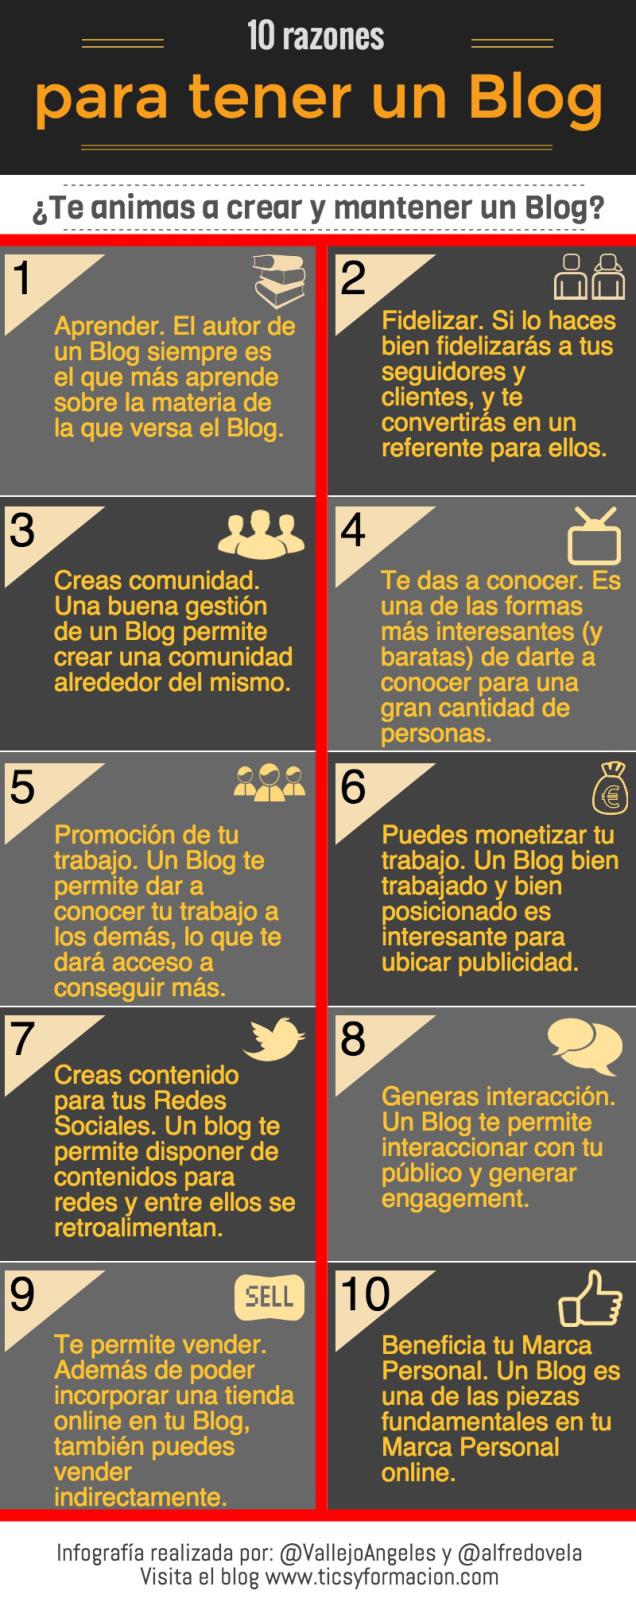 10 razones para tener un Blog [#infografia]